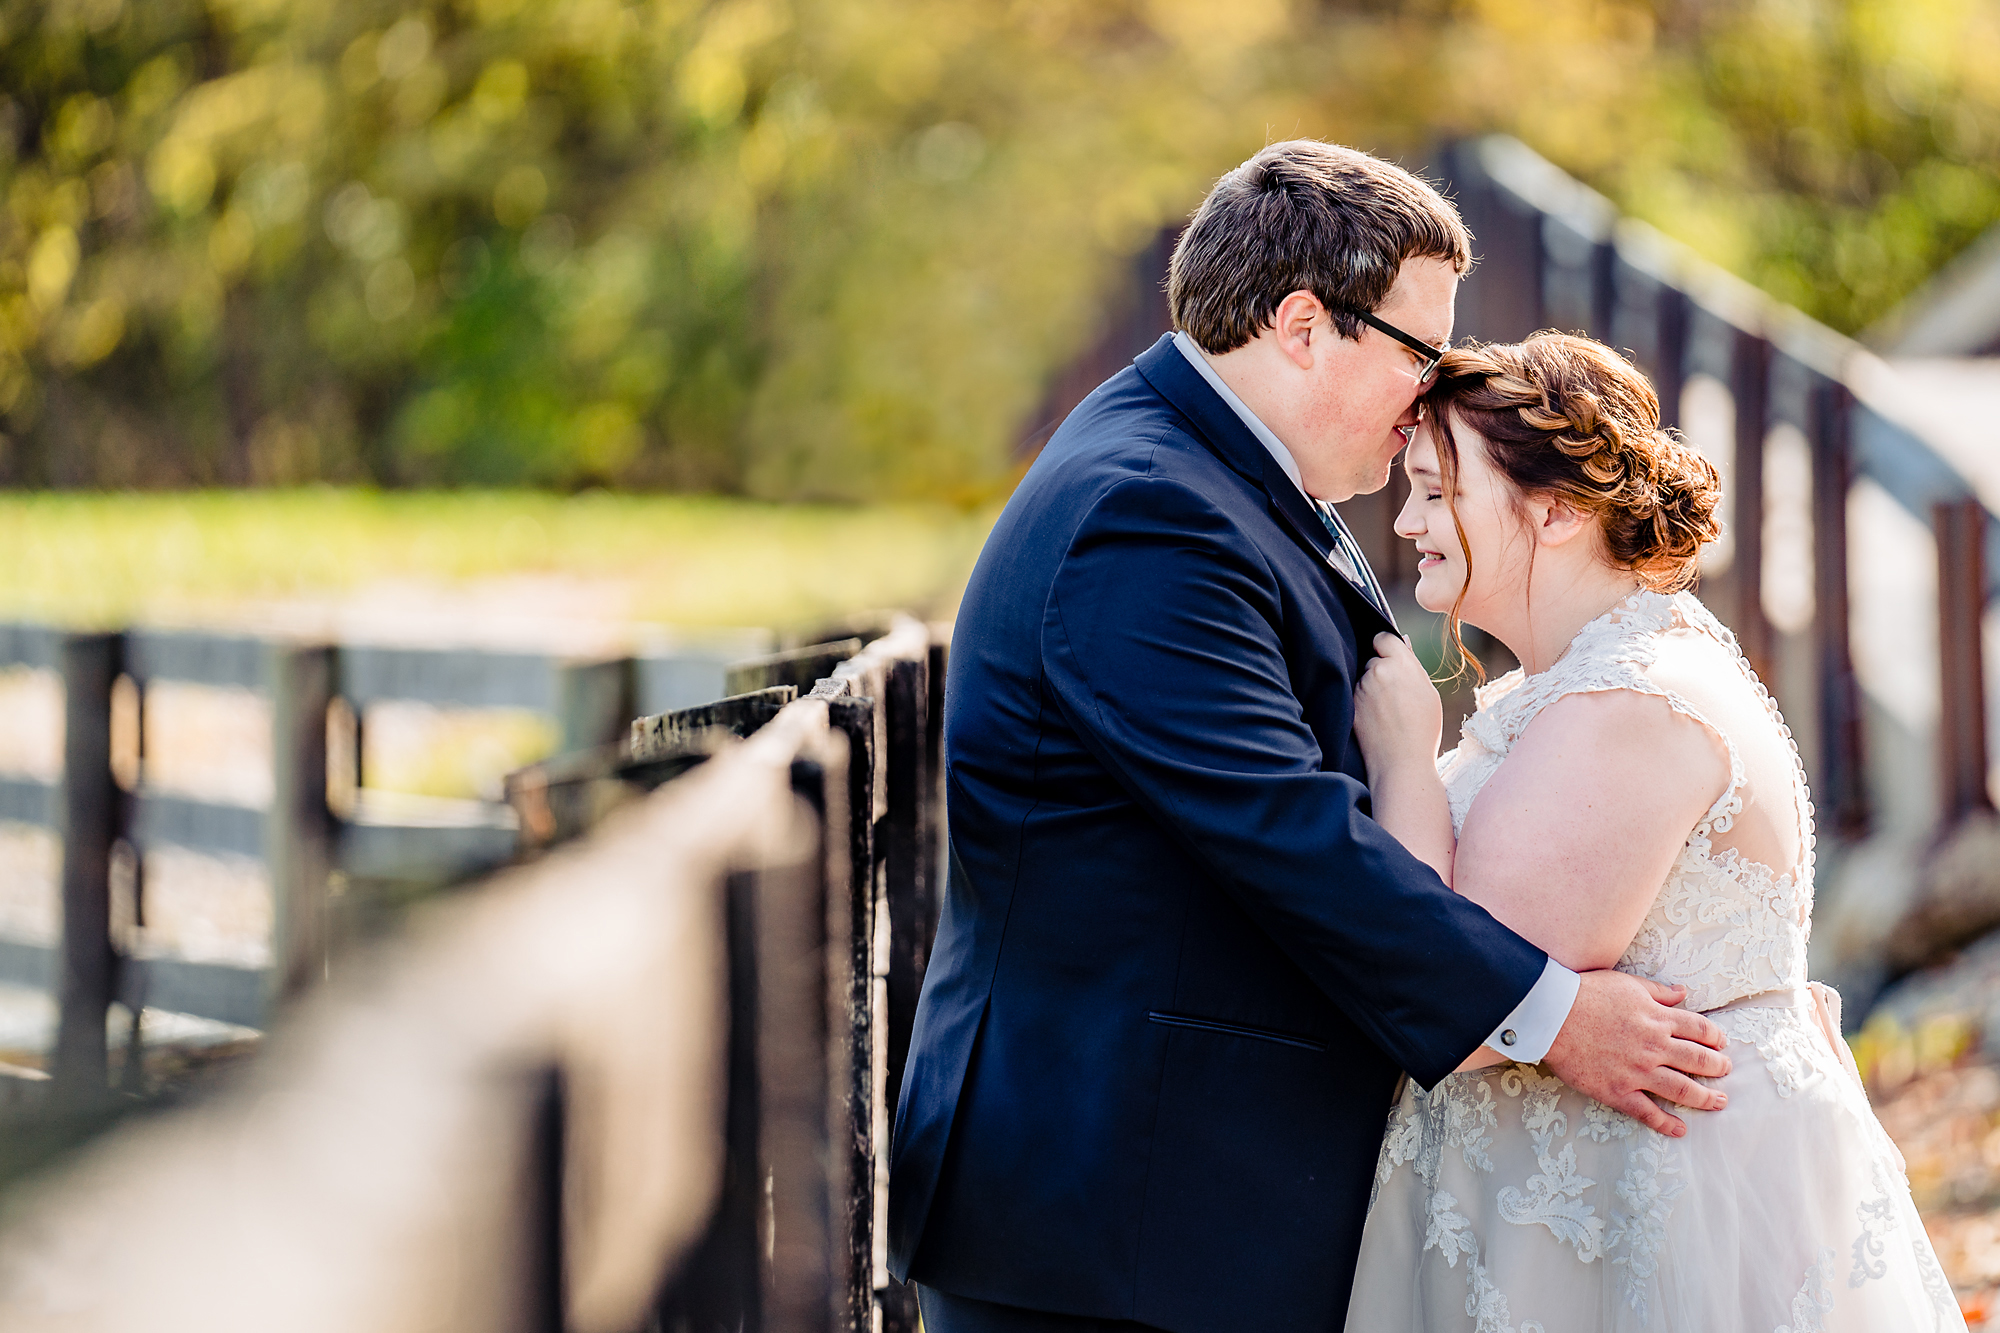 Silver-Creek-Stables-Wedding-Photography-11.jpg